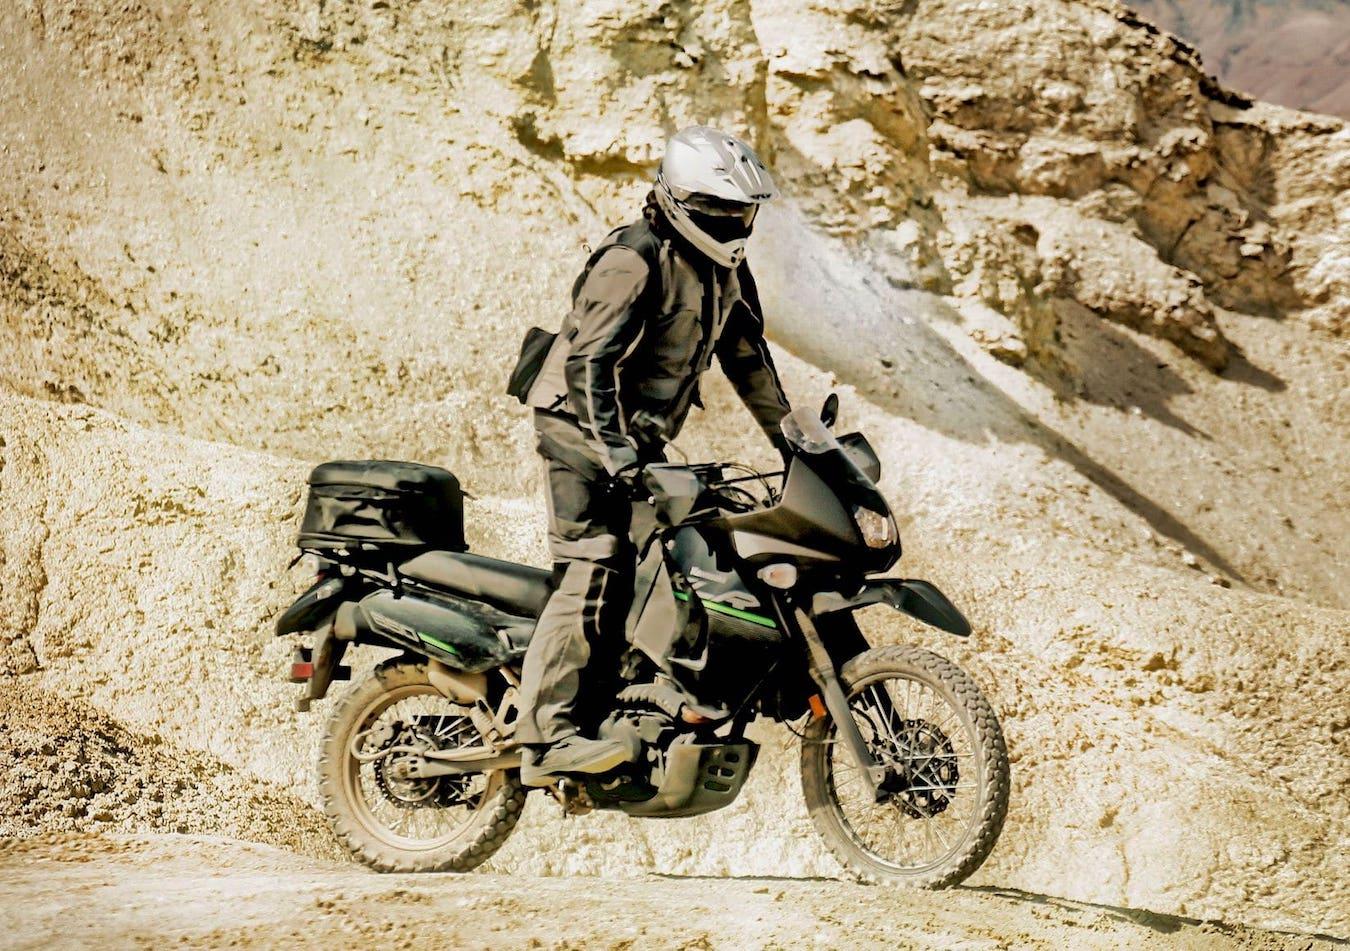 The Kawasaki KLR650 in mid-adventure